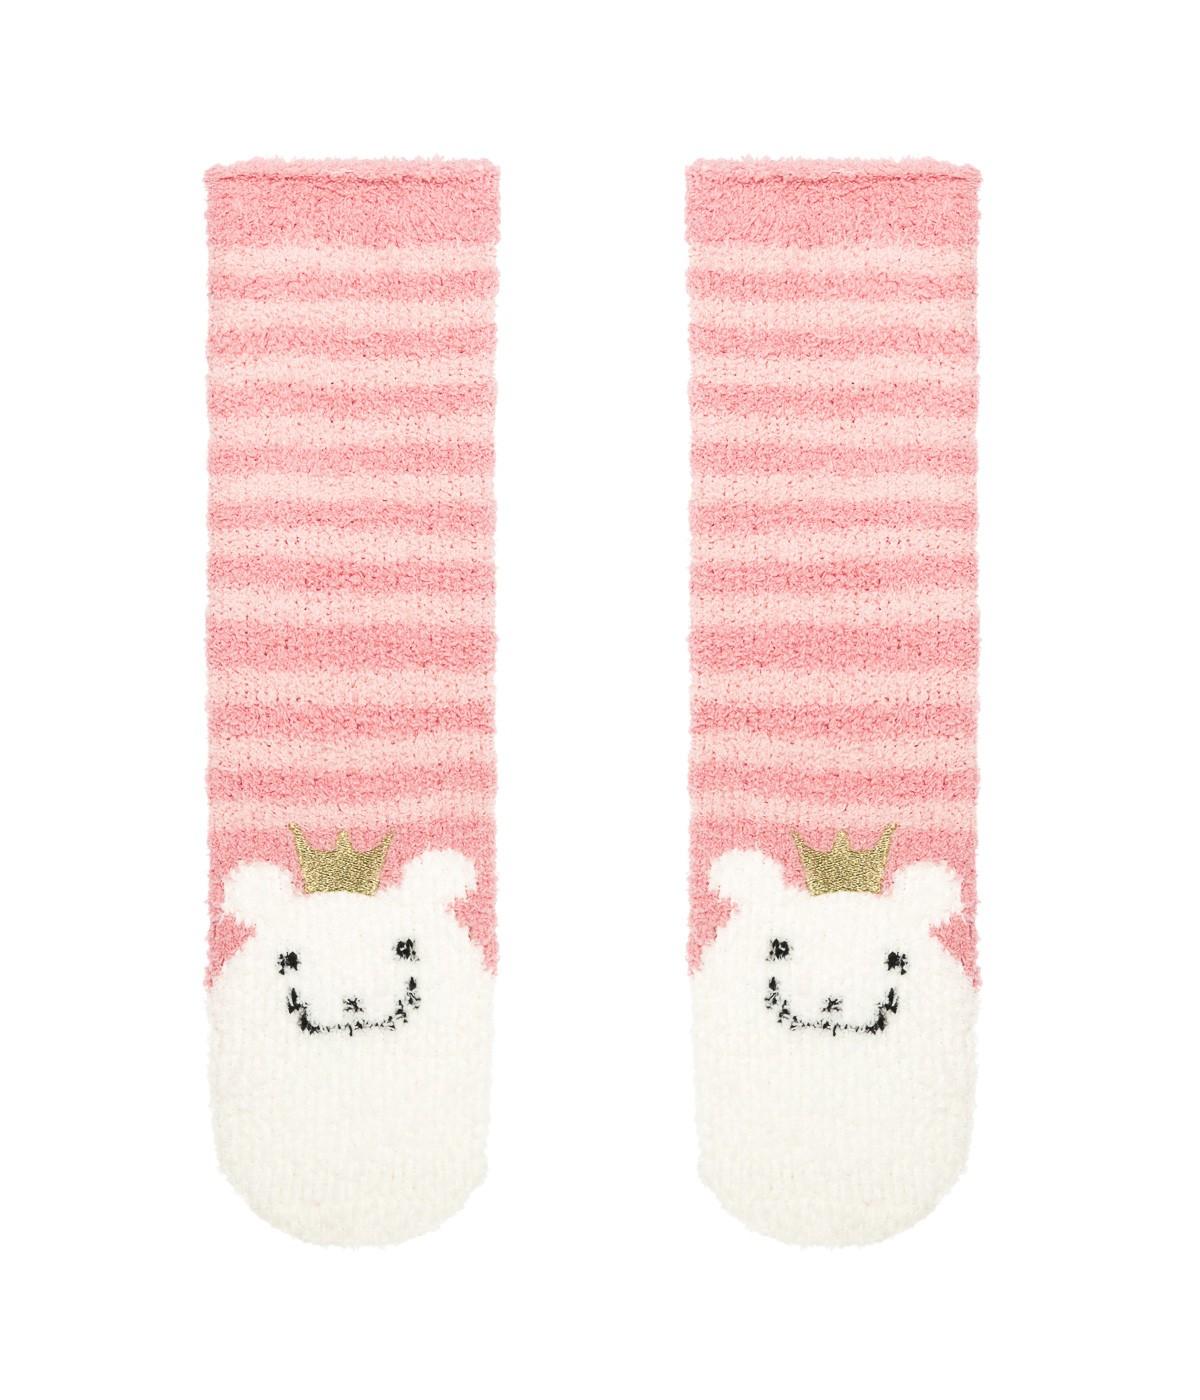 King Bear Socks